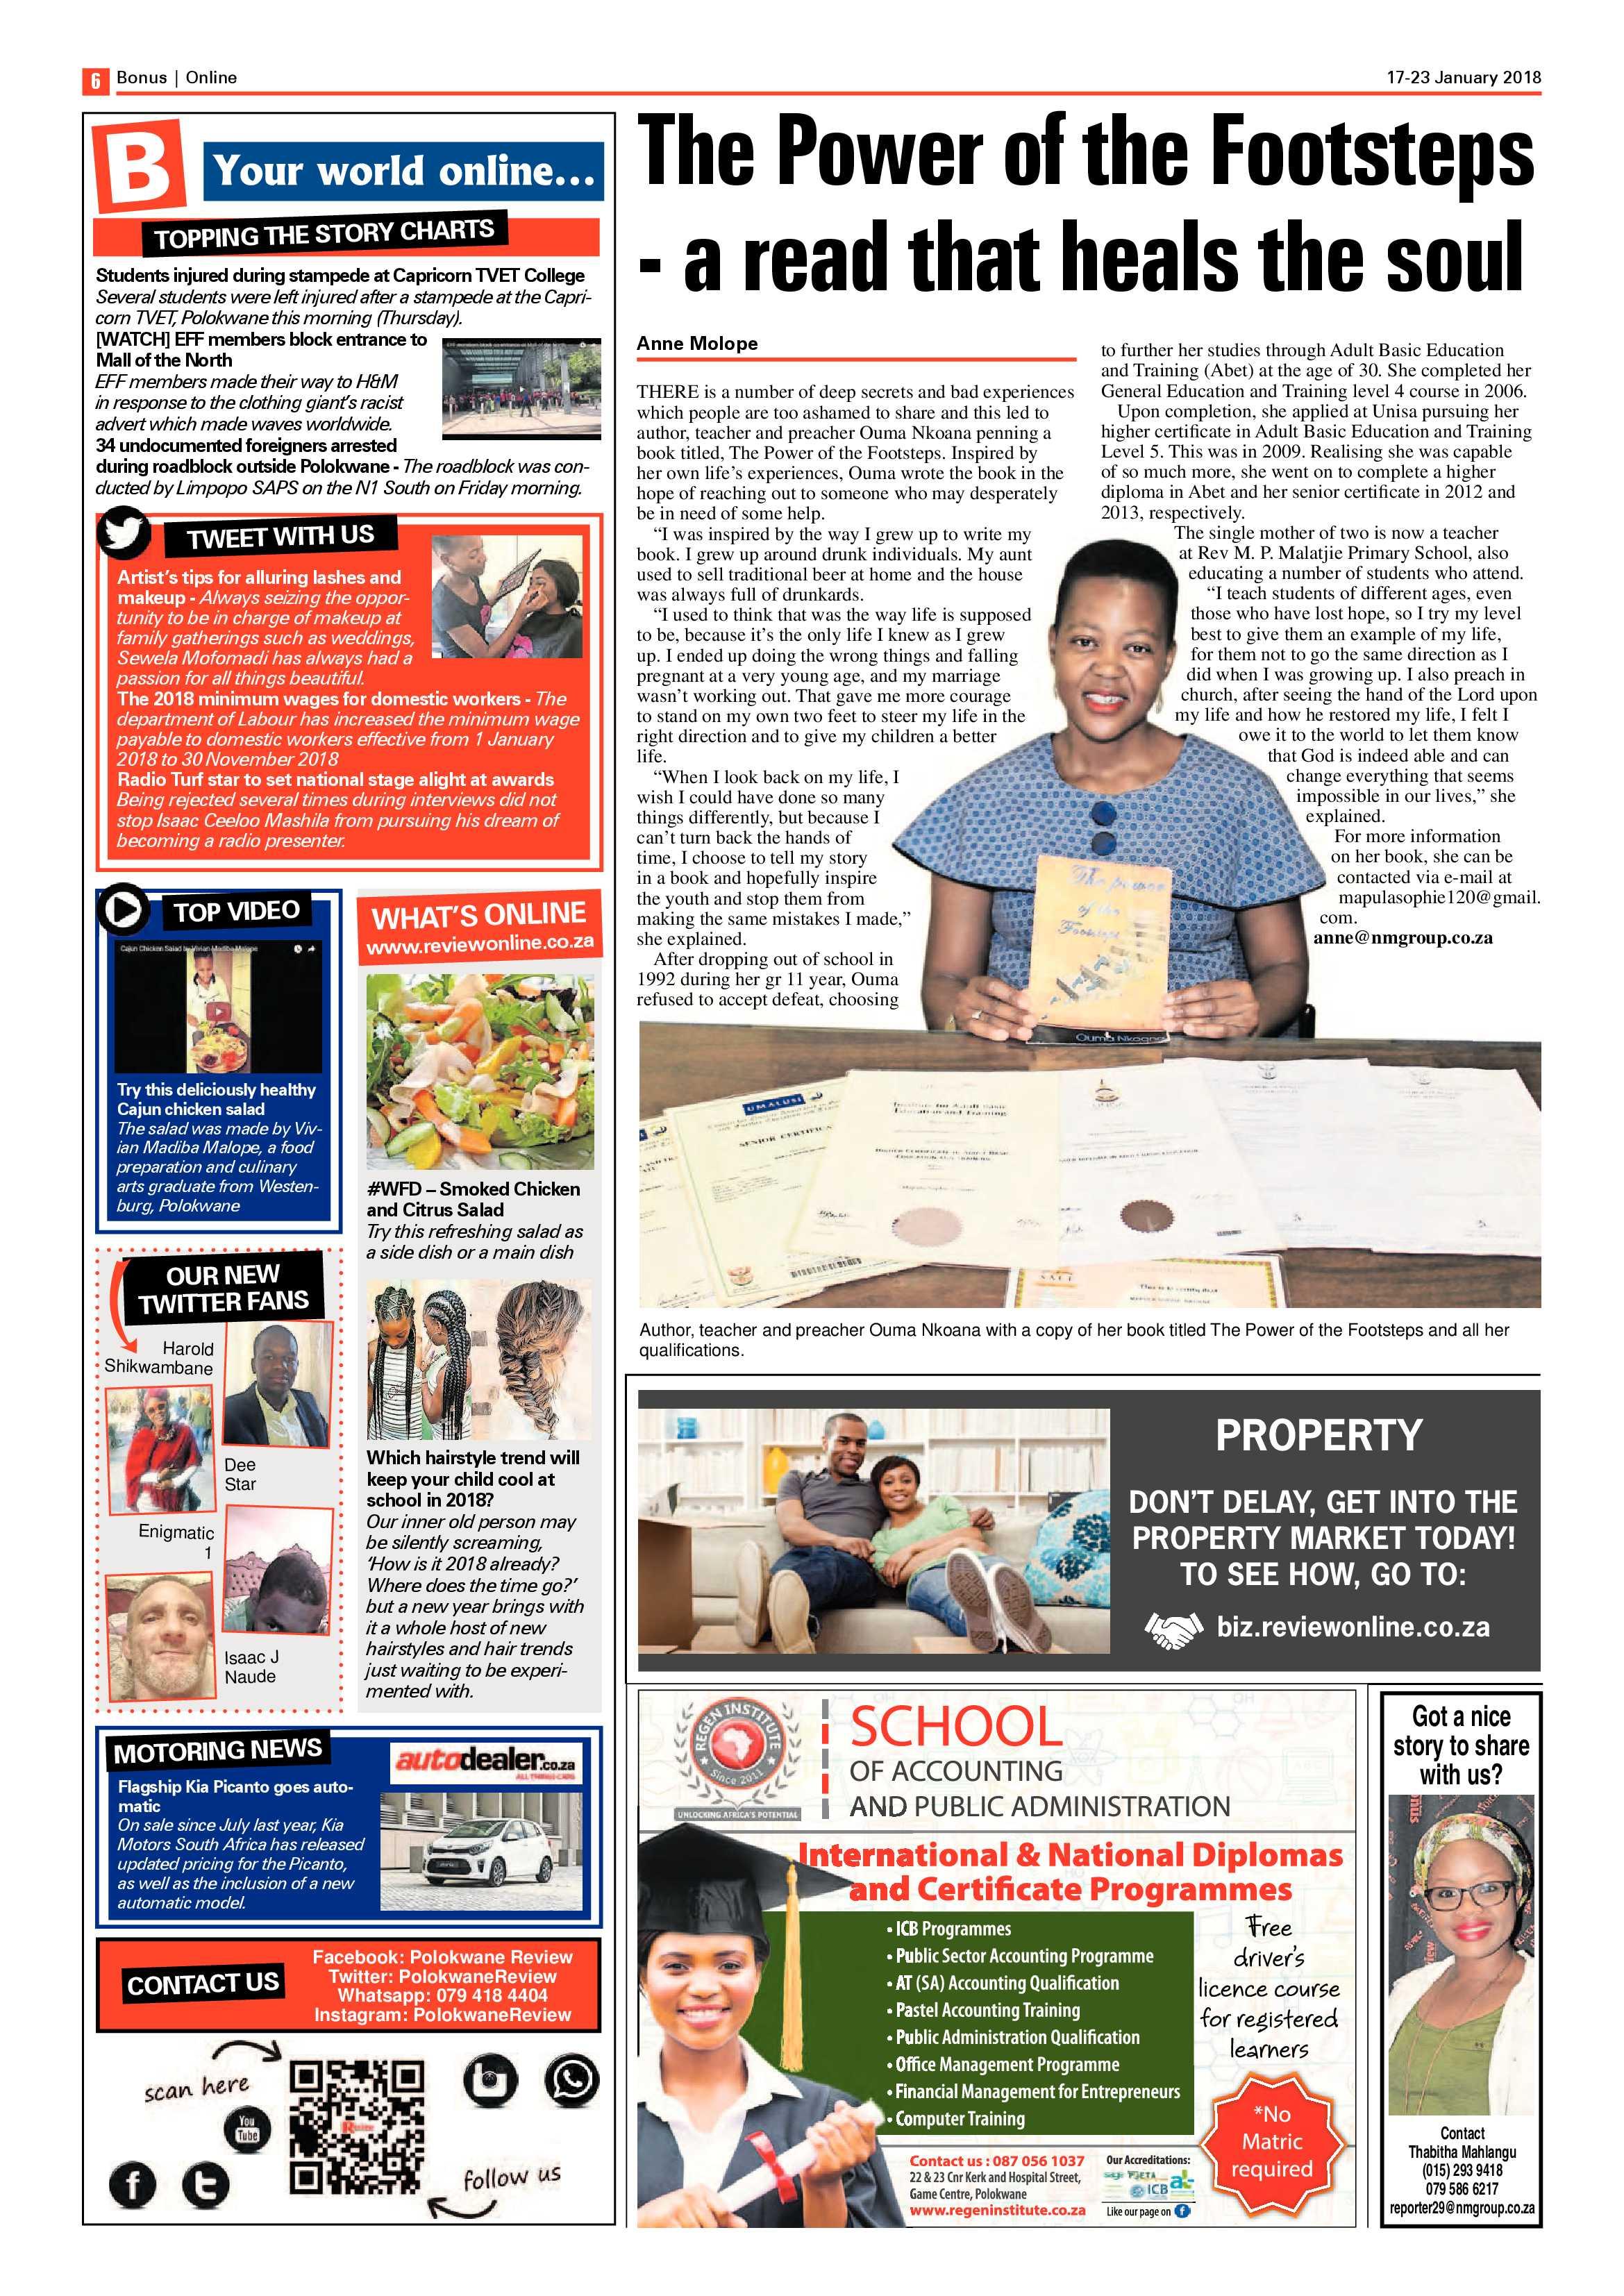 review-bonus-17-january-2018-epapers-page-6